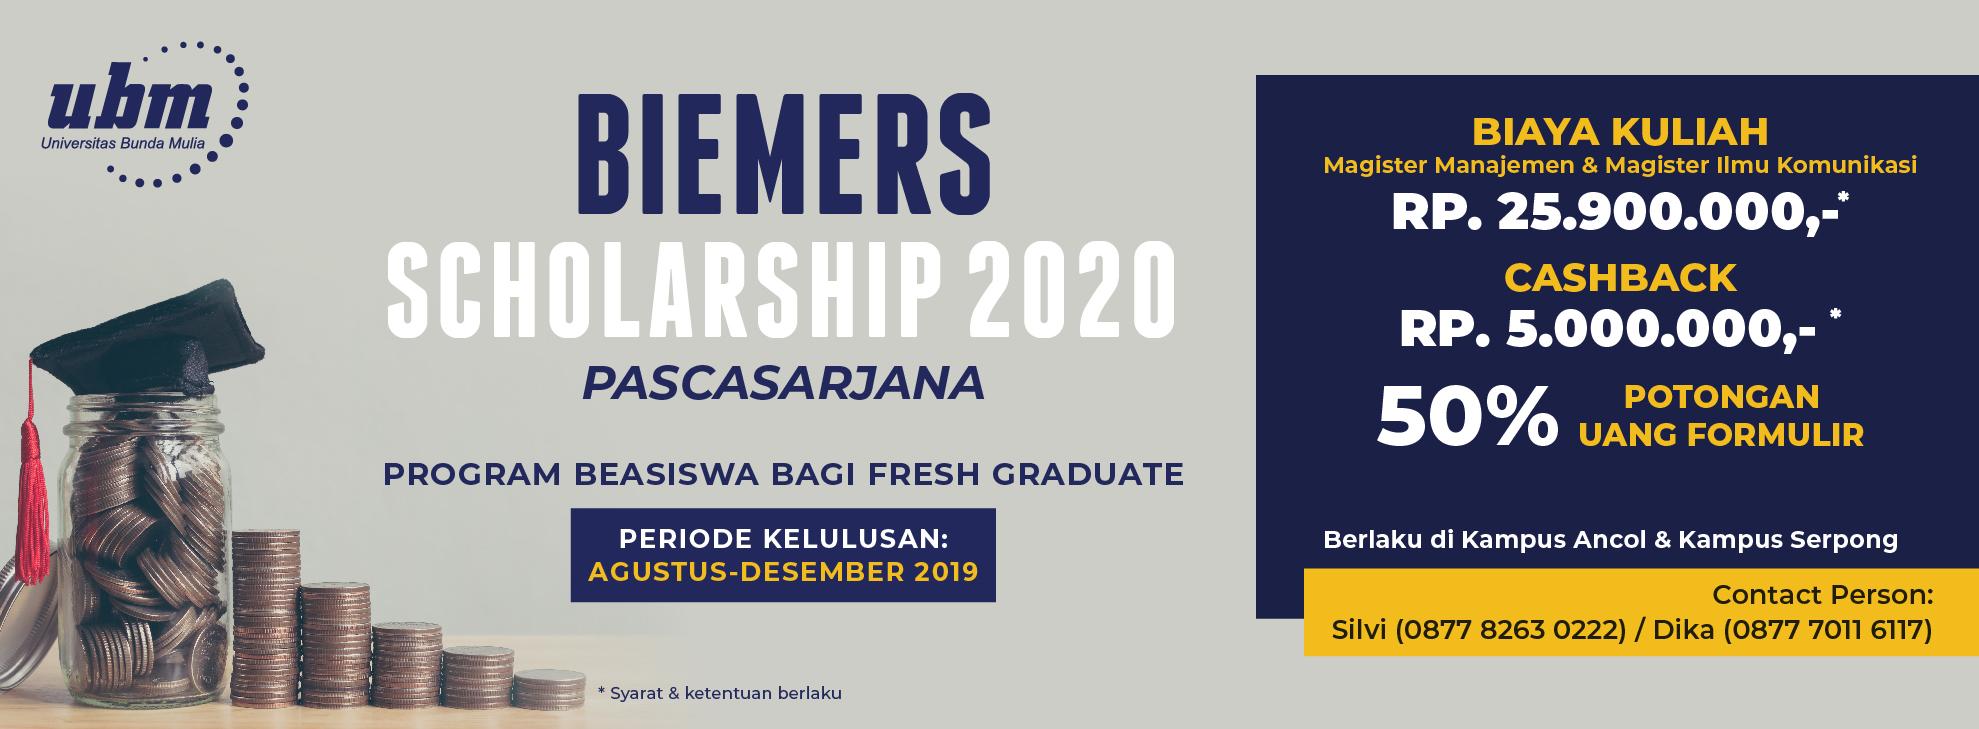 950X350_web-banner_Biemers-scholarship-01